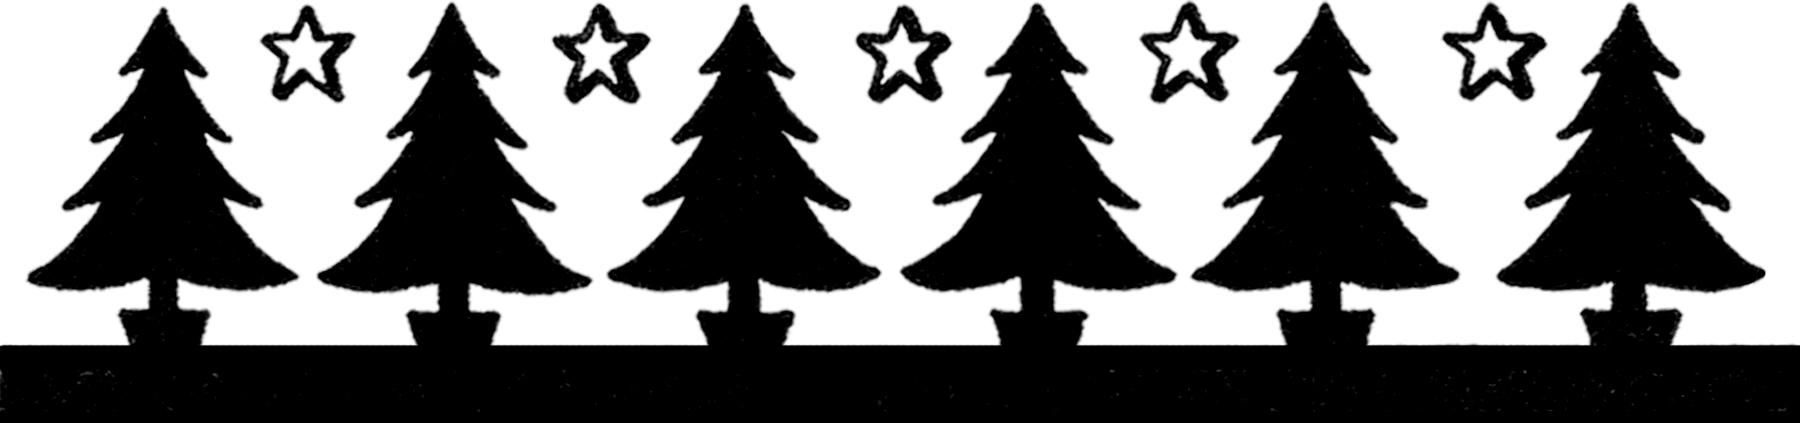 Christmas Tree Silhouette Border Image.